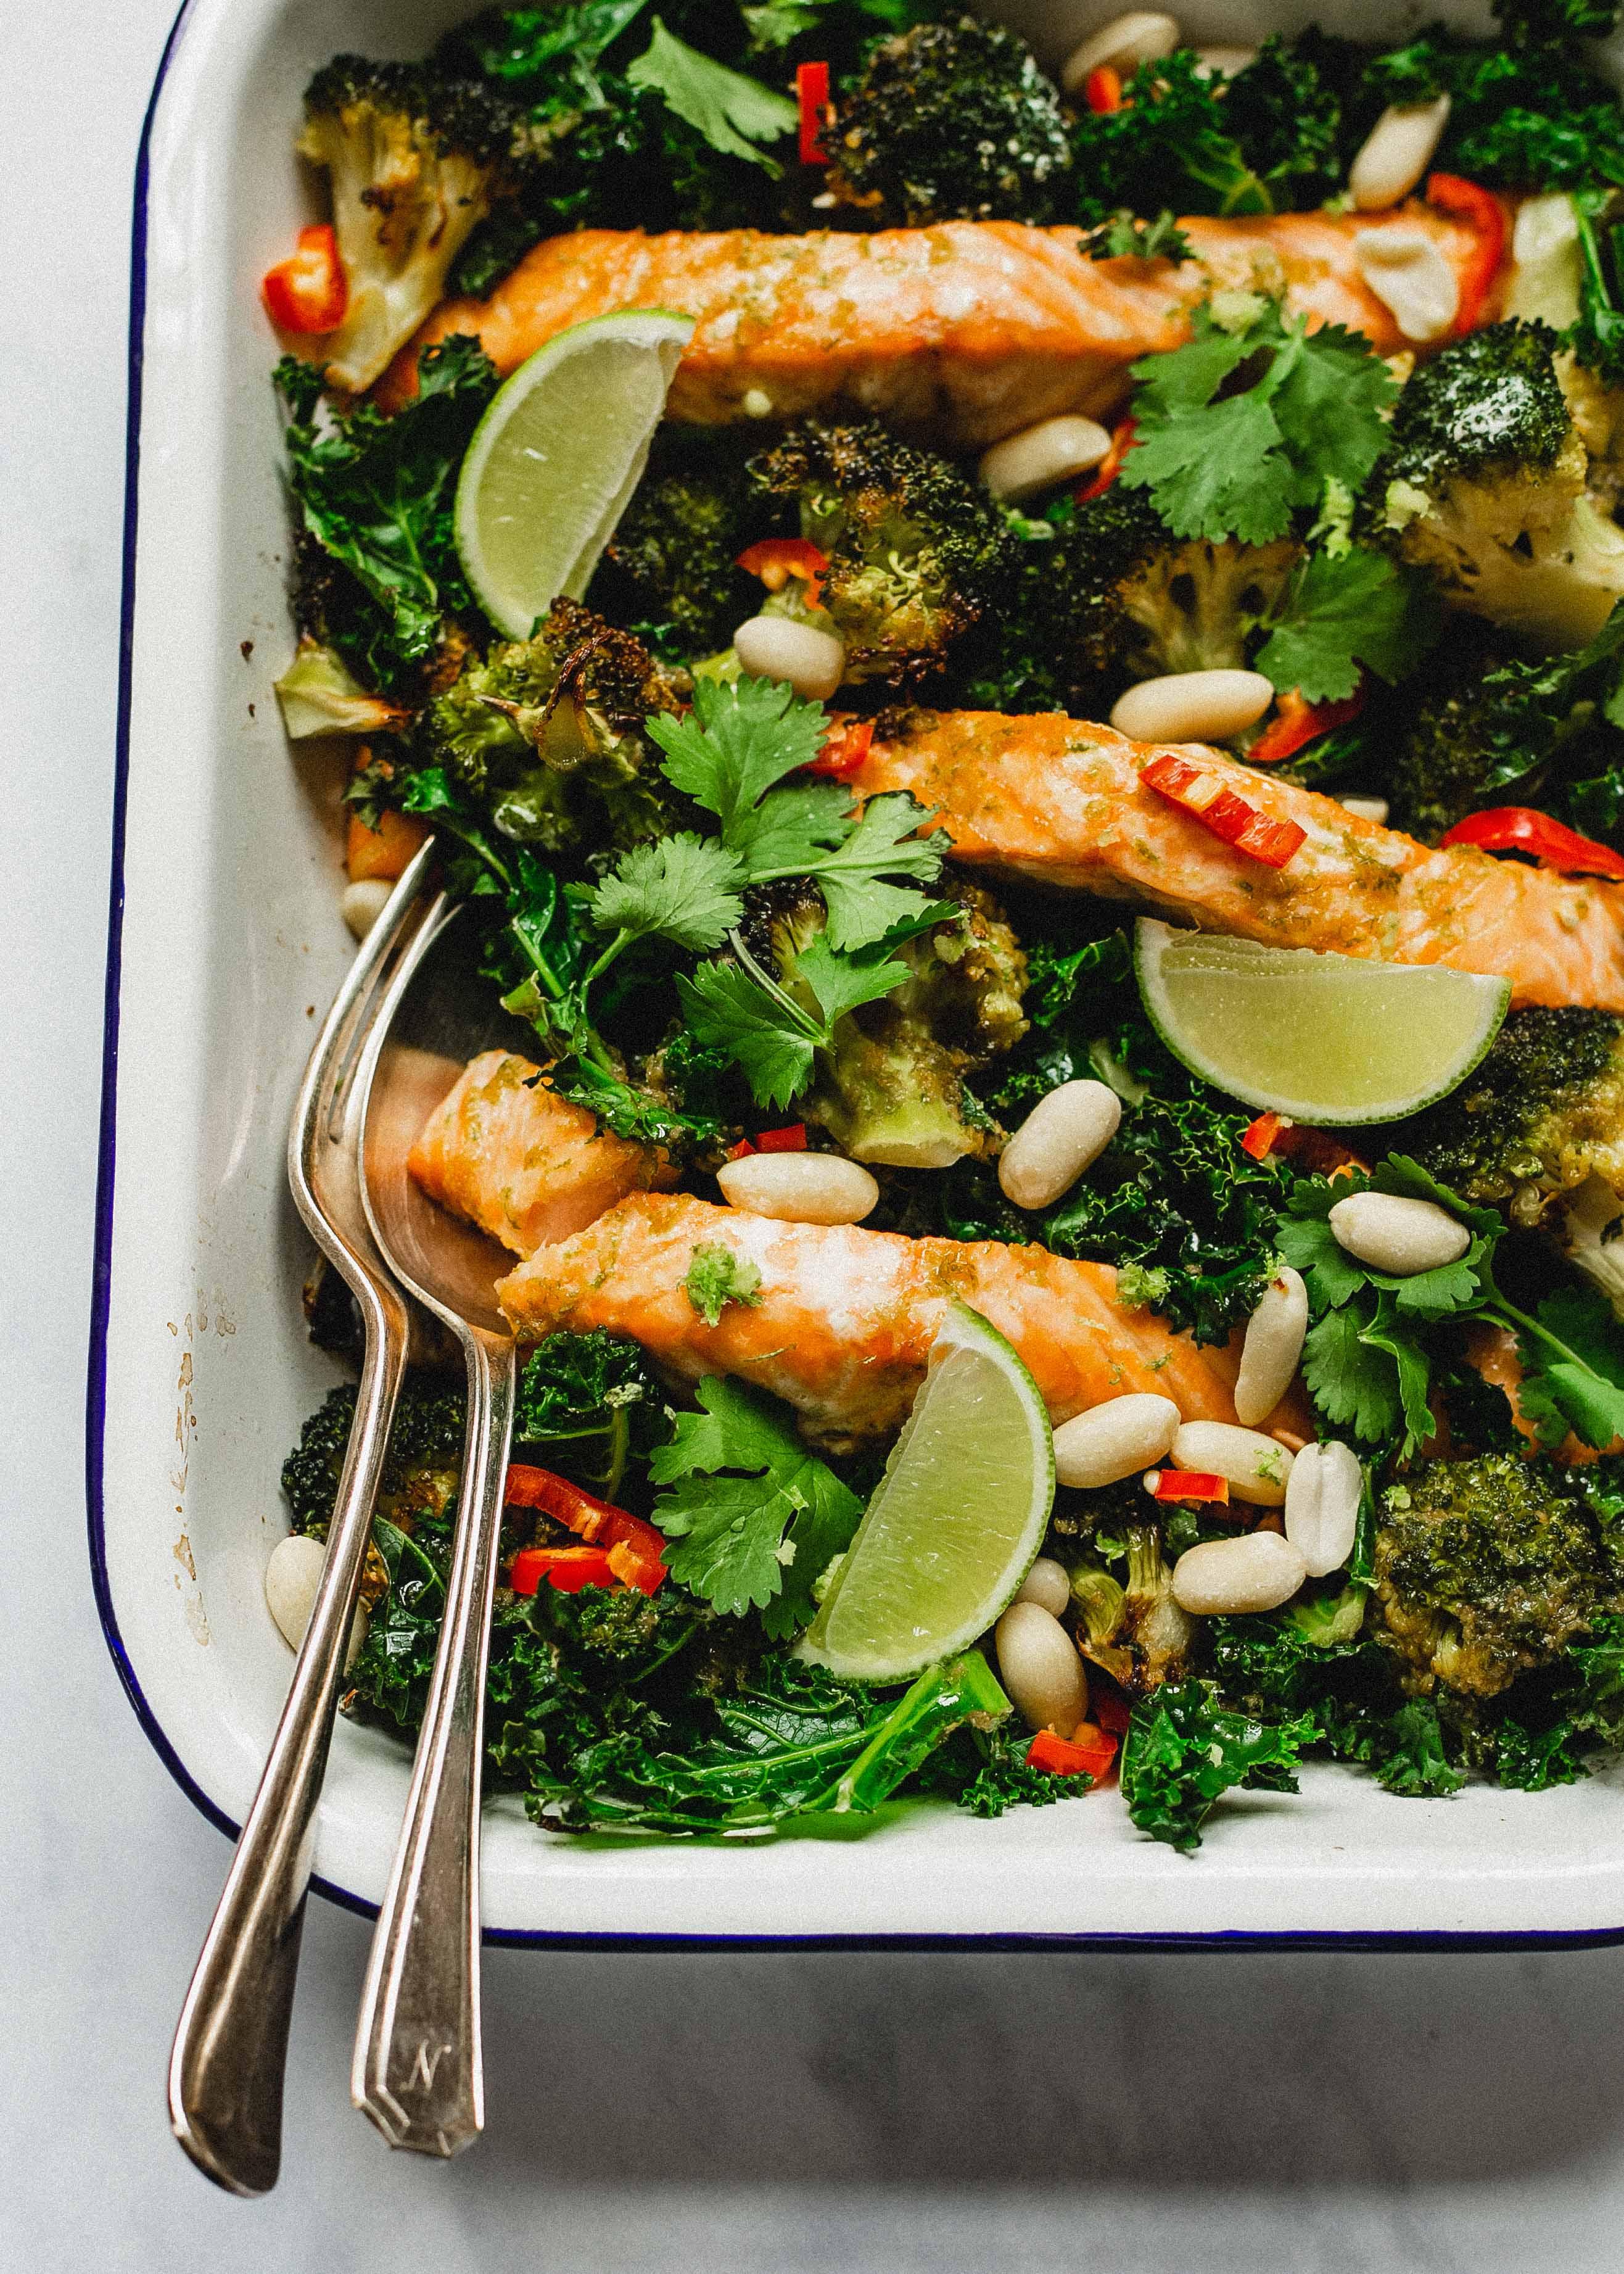 Low FODMAP roast salmon and broccoli traybake